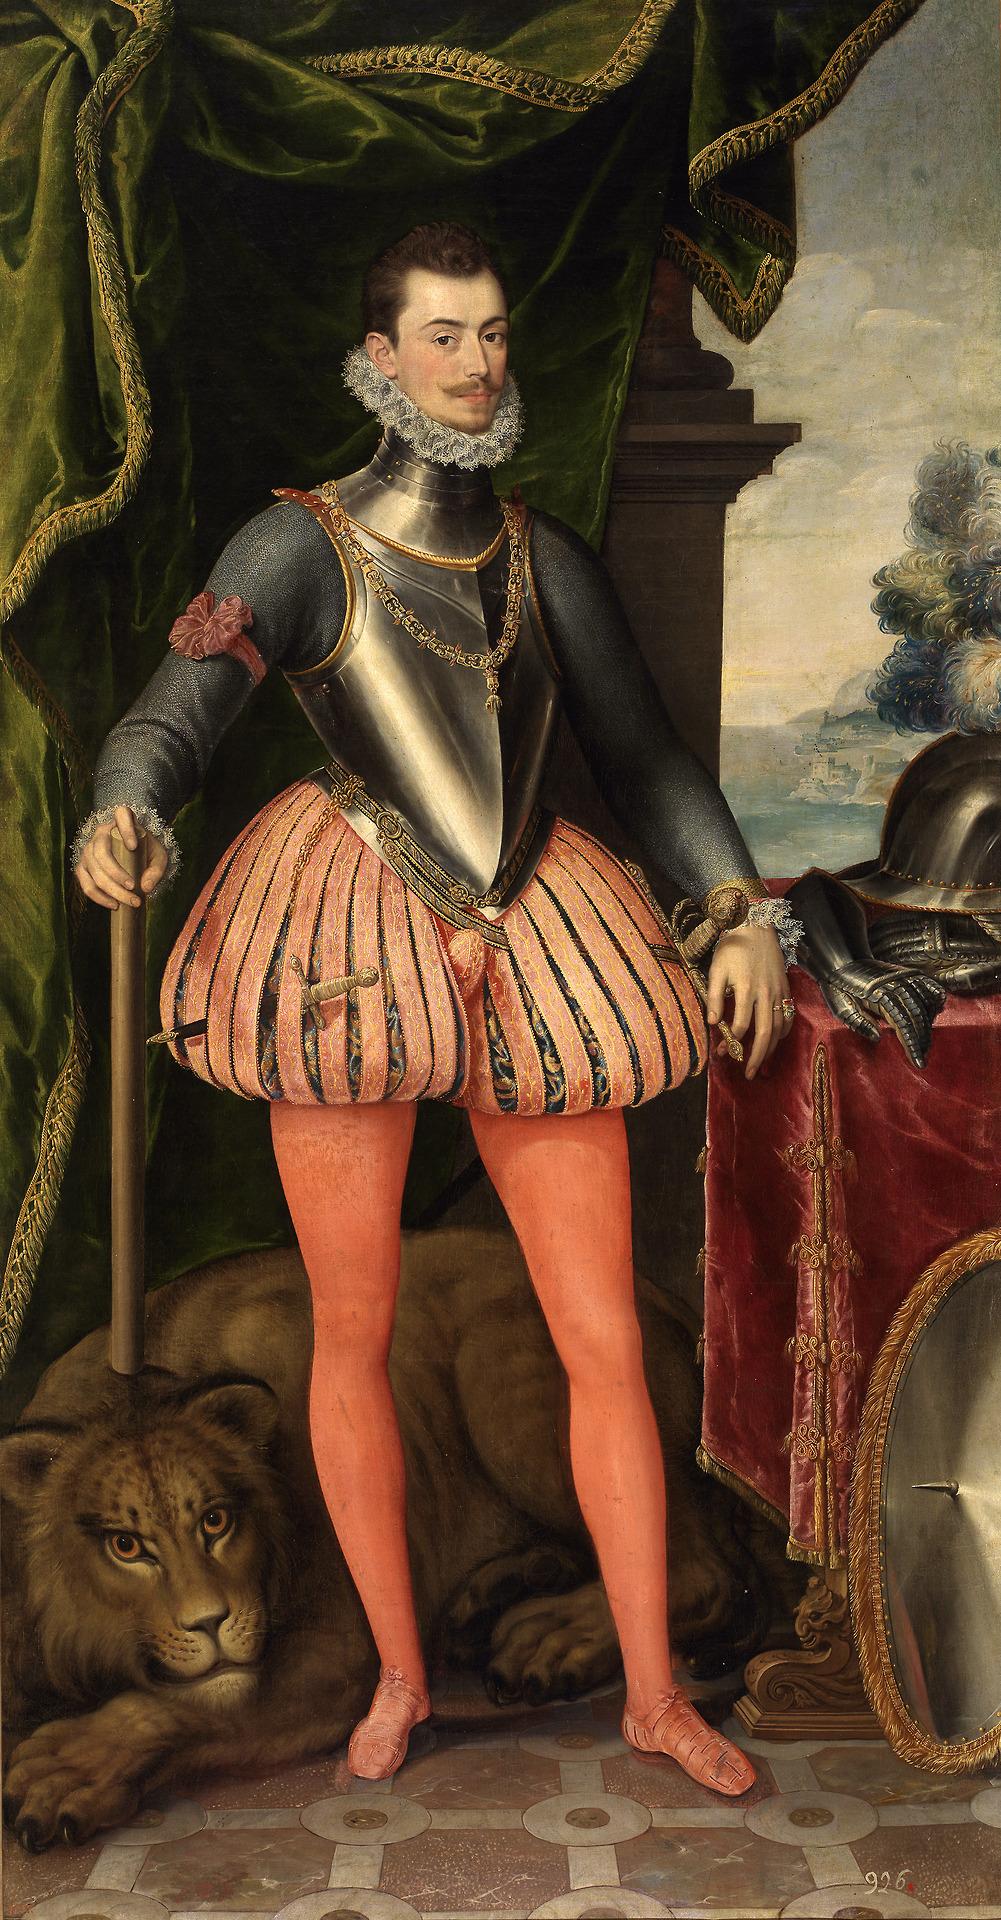 juan_pantoja_de_la_cruz_don_juan_of_austria_1547-1578.jpg